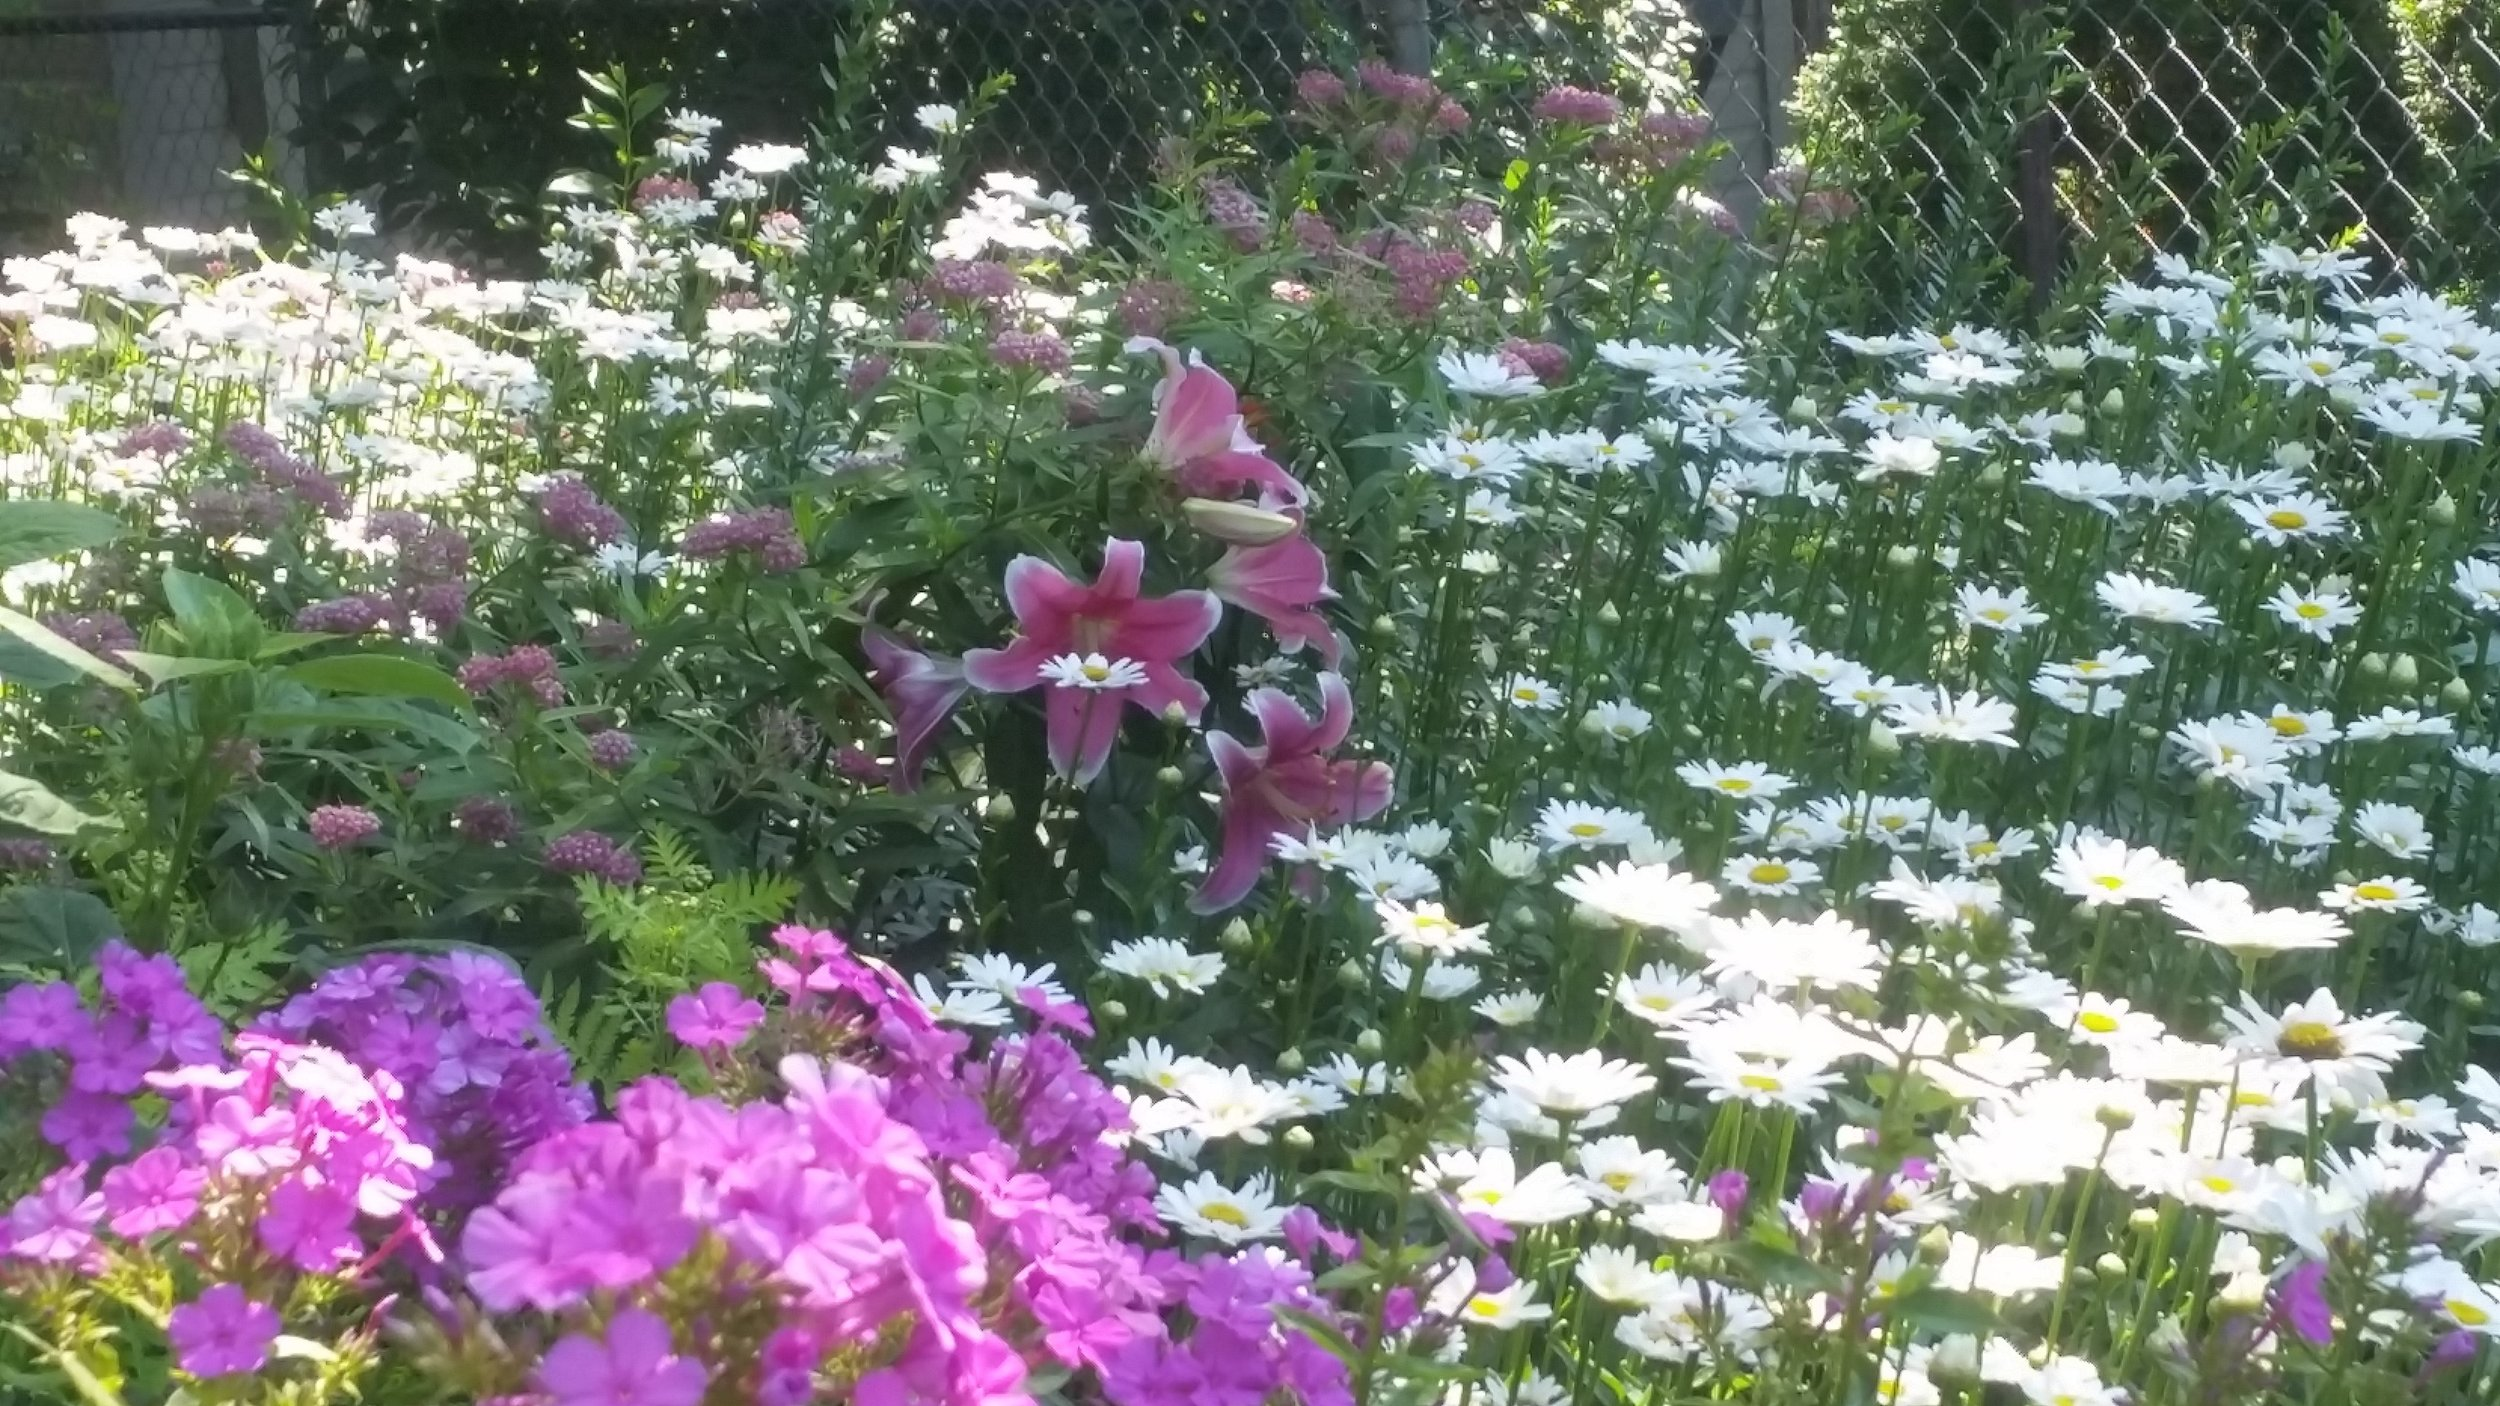 Lily daisy phlox.jpg